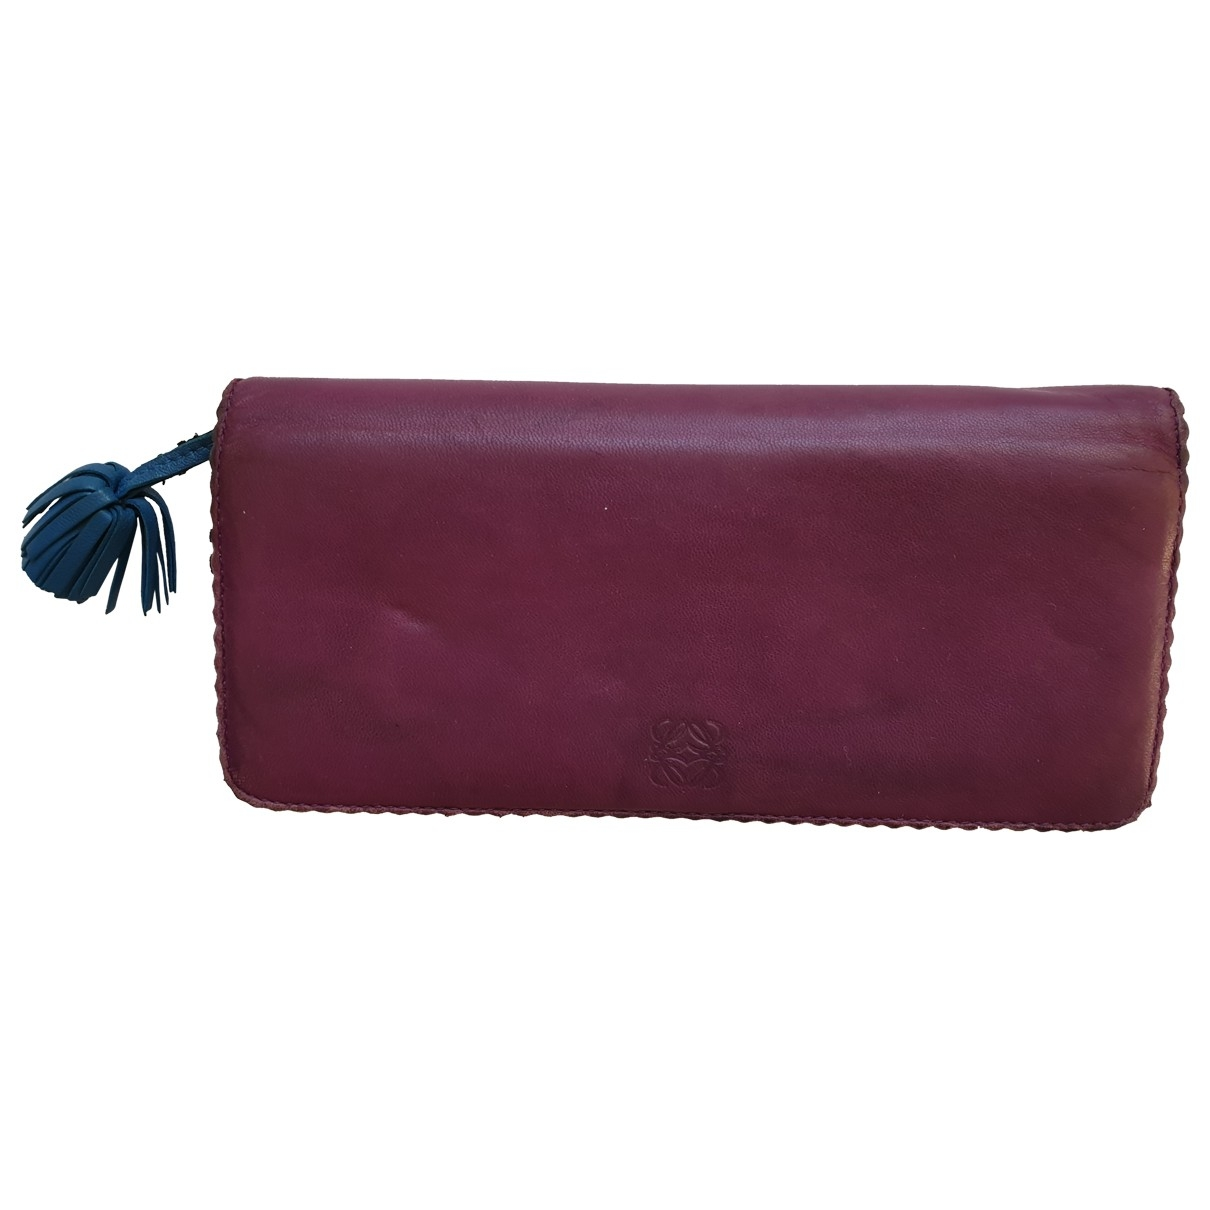 Loewe - Portefeuille   pour femme en cuir - violet